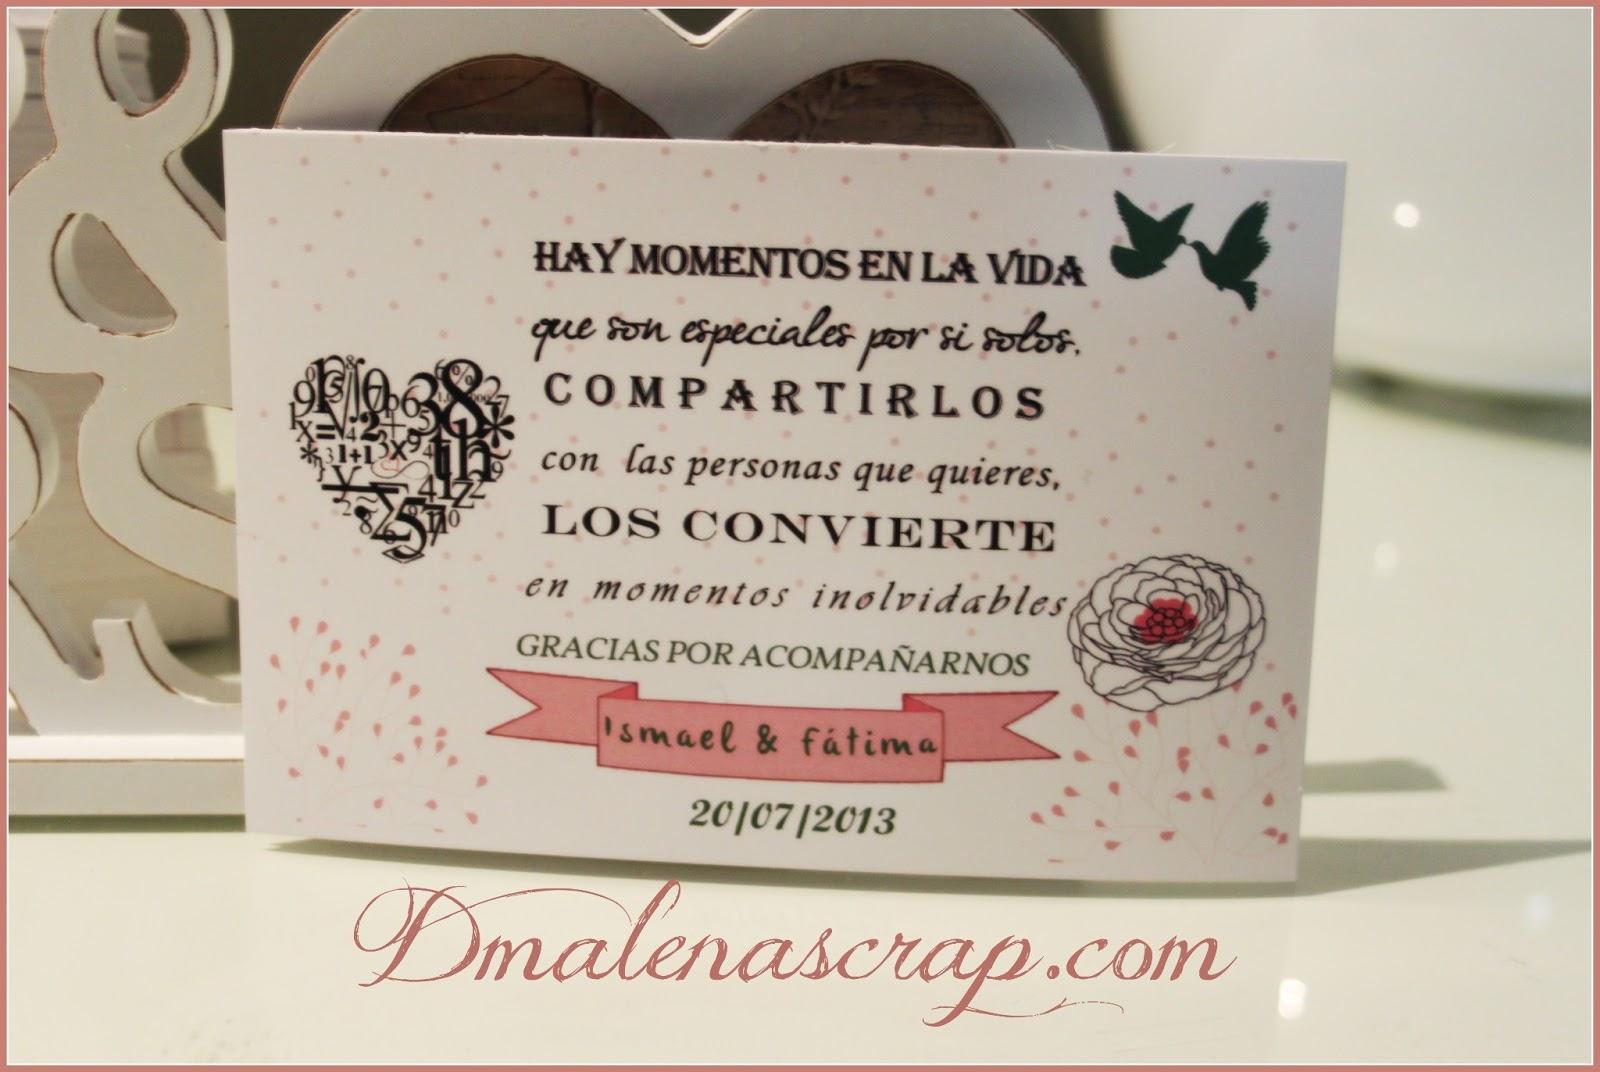 1000 images about boda on pinterest bodas vestidos and - Tarjeta de boda ...